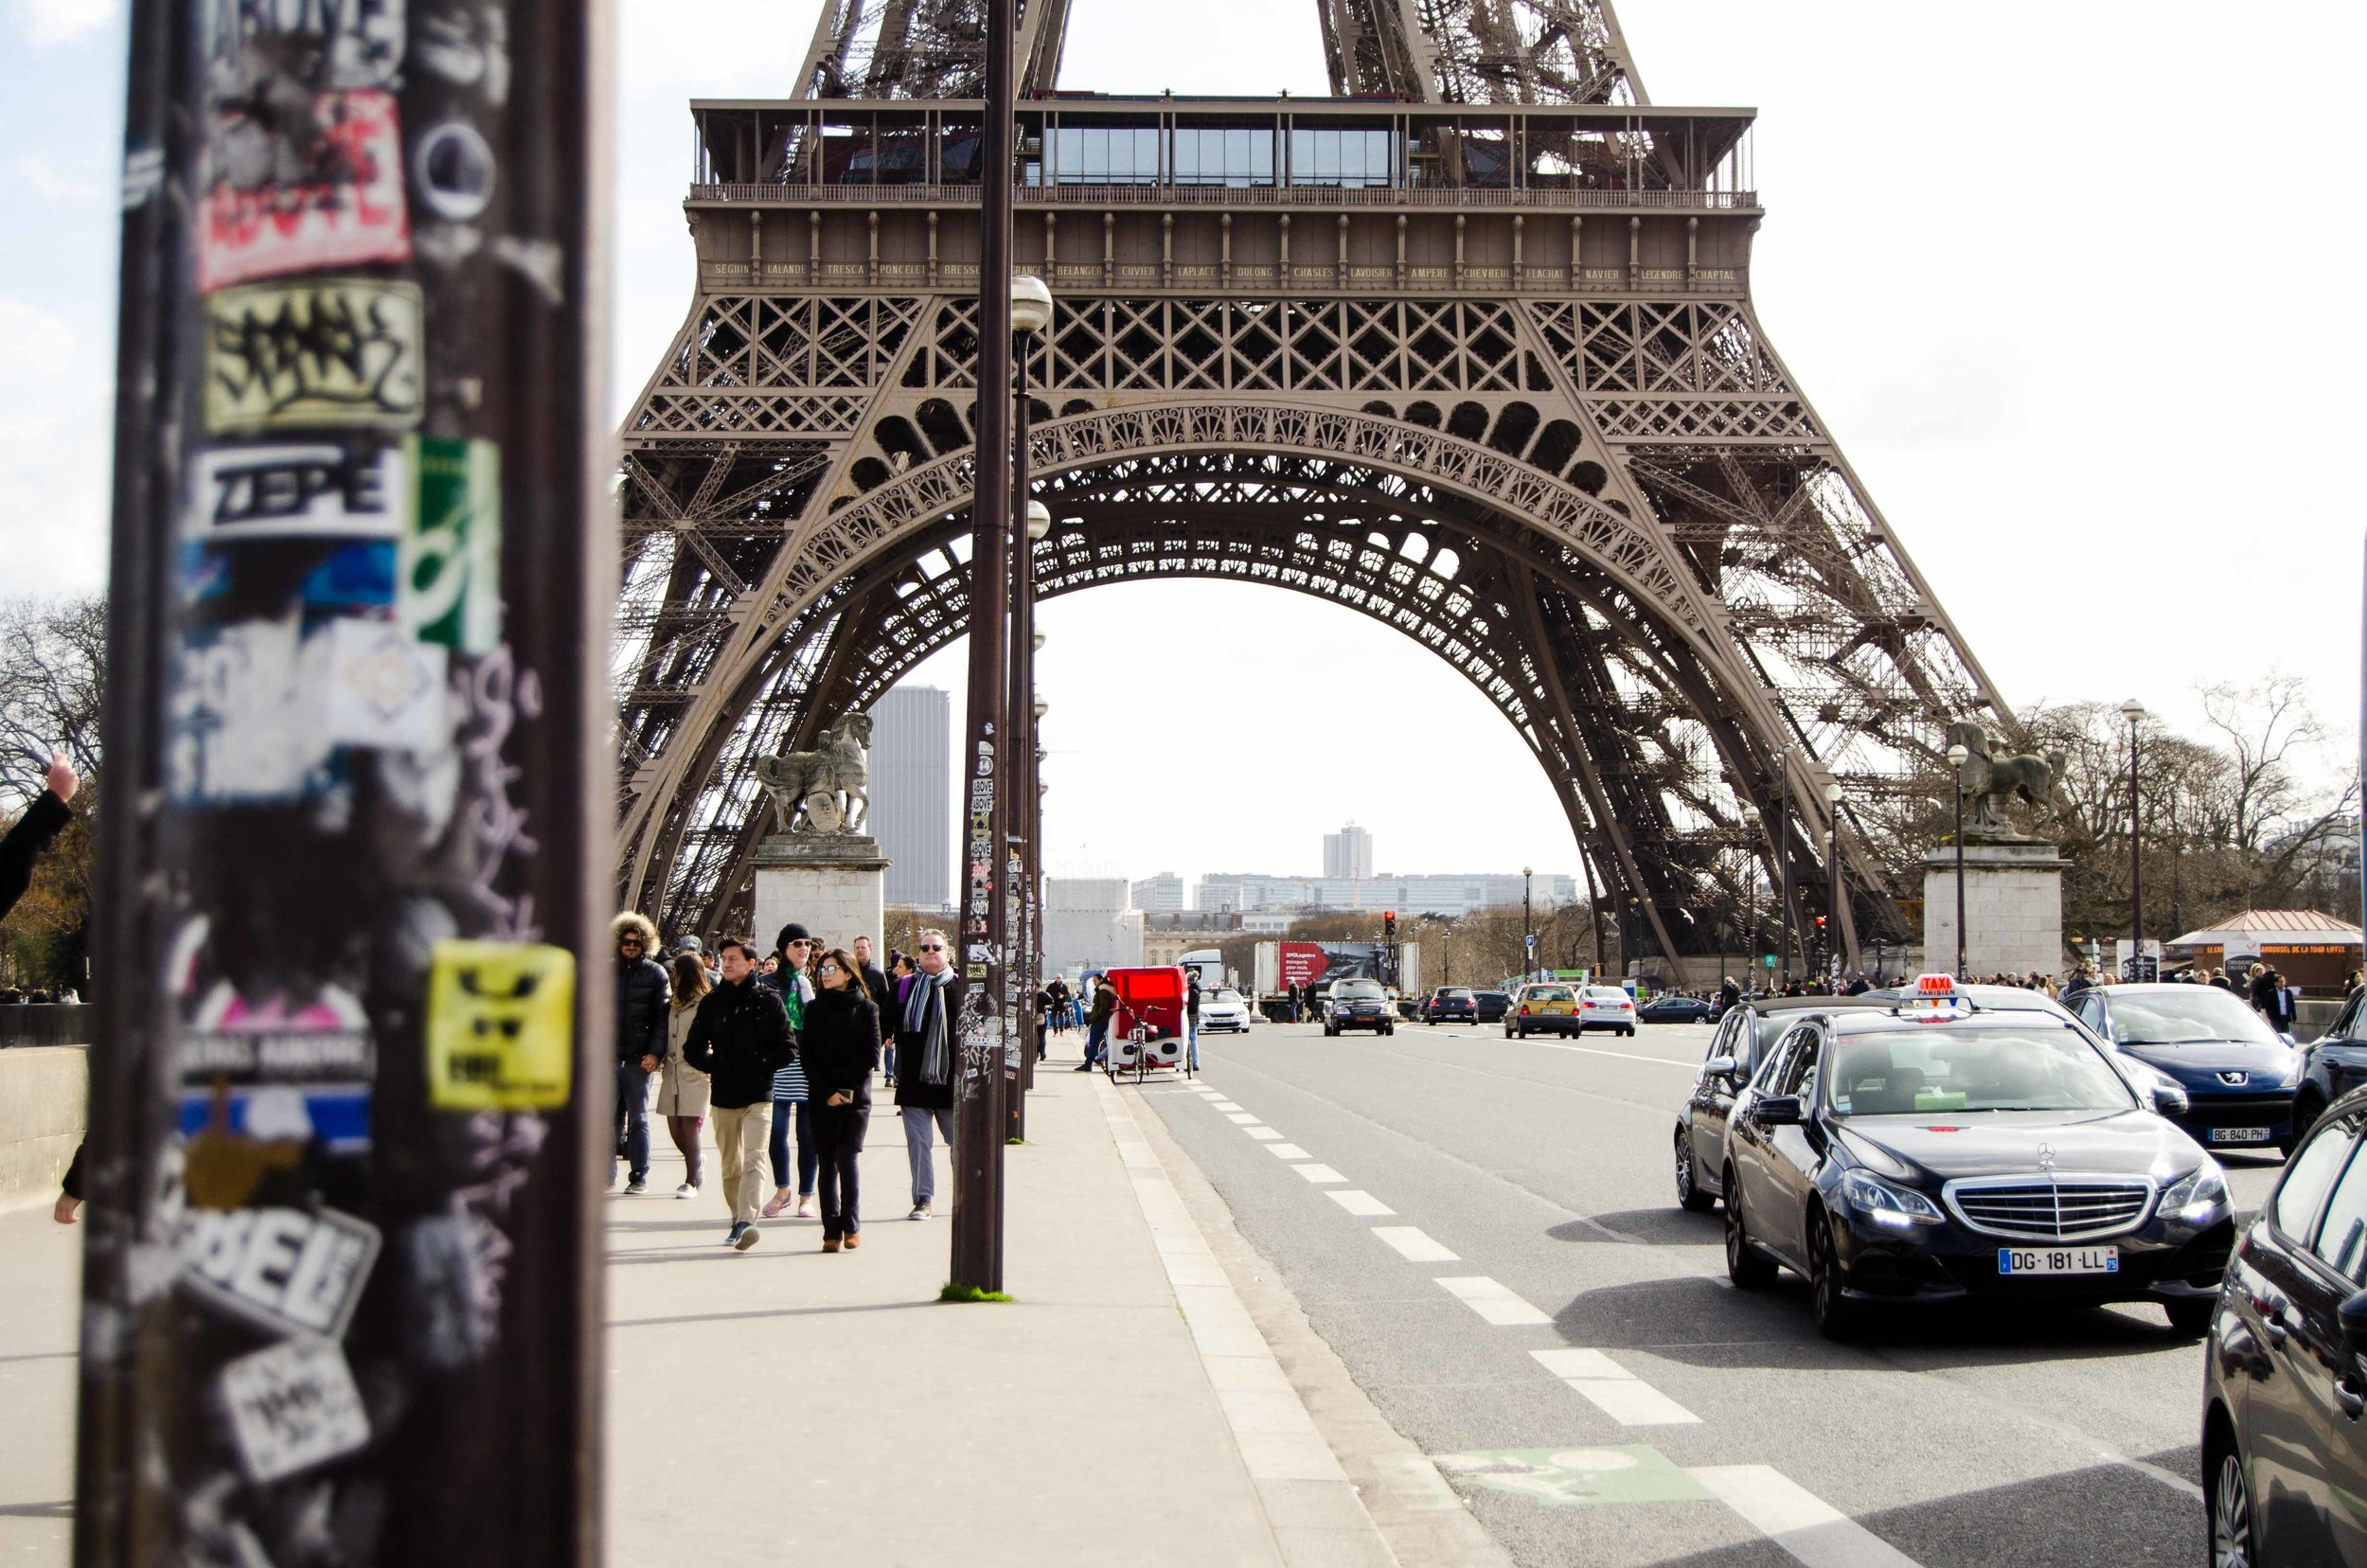 march 2 // street scene northwest of the Eiffel Tower